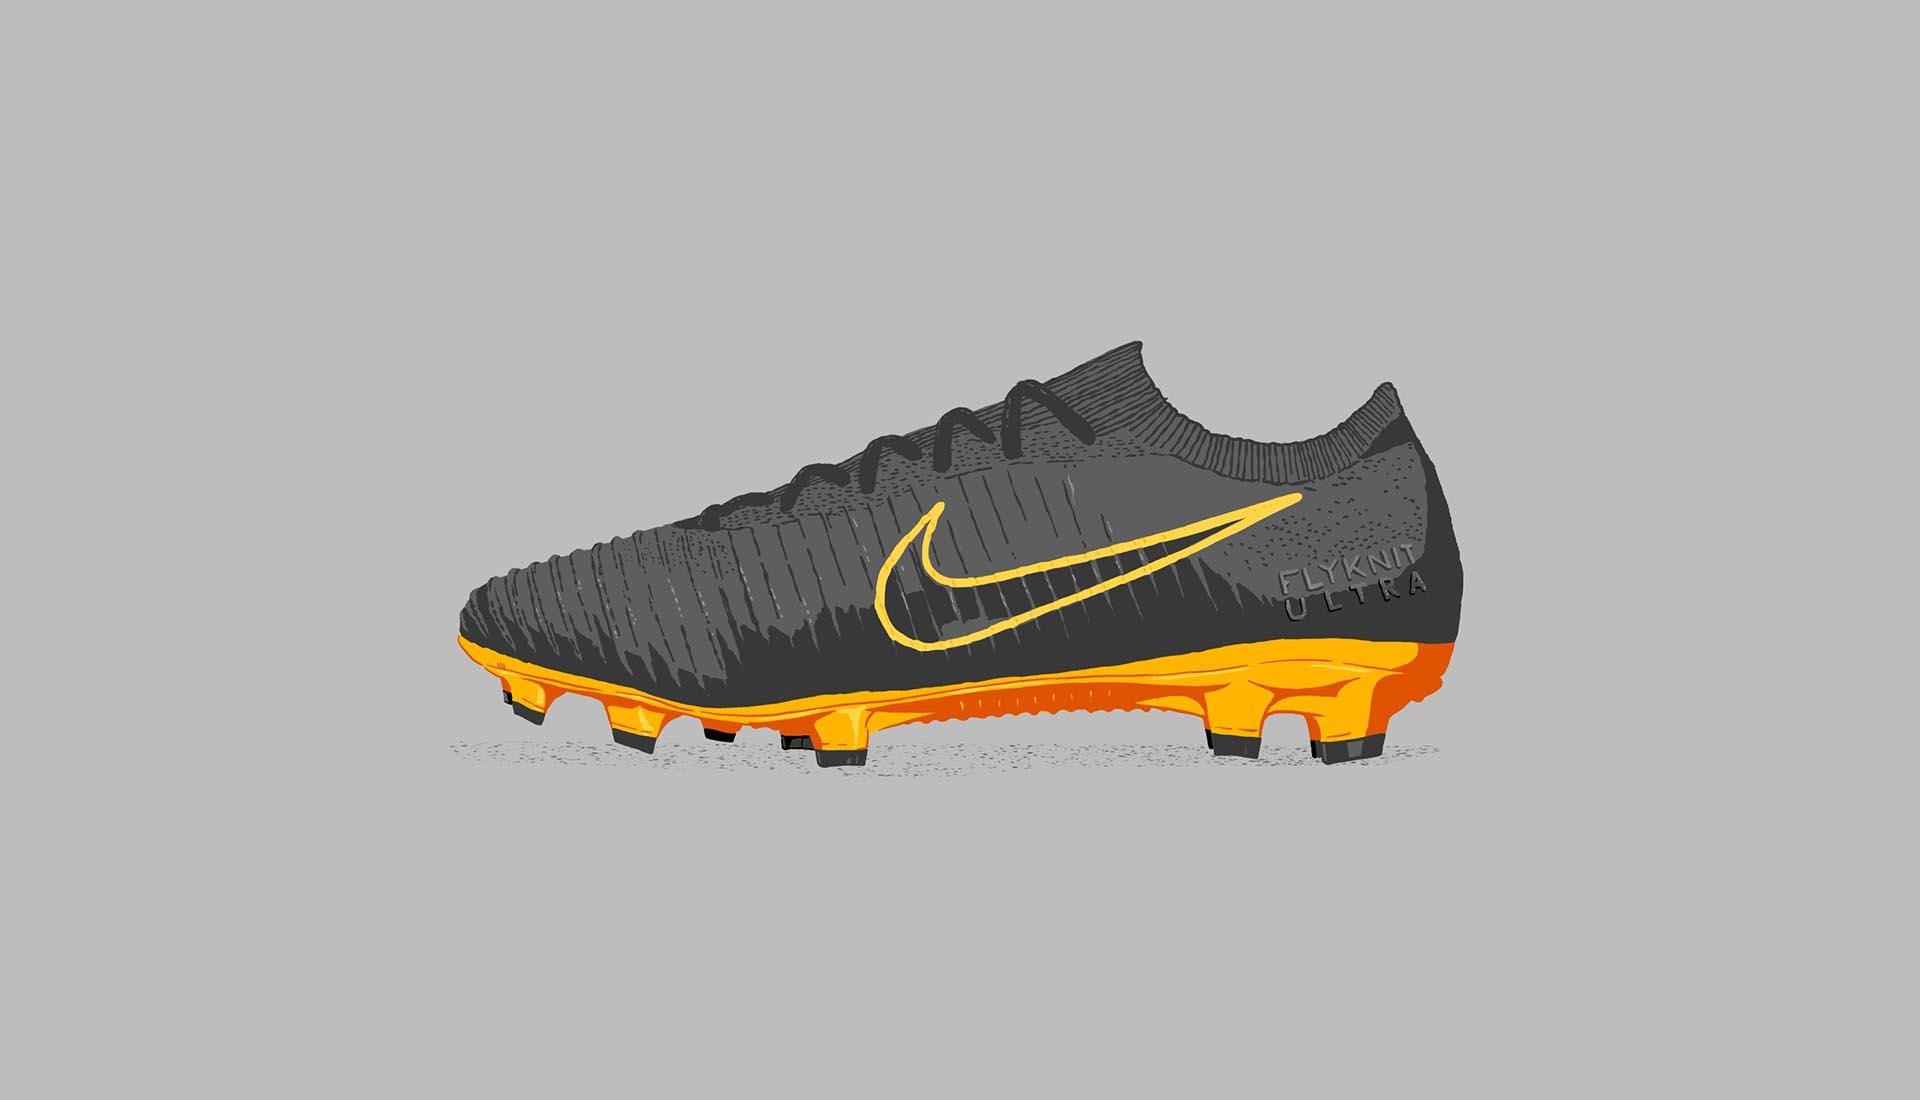 c3fc9931ed8b ild Hazard soccerbible  mercurial_0004_Mercurial_Flyknit_Ultra_Boot_090617.jpg